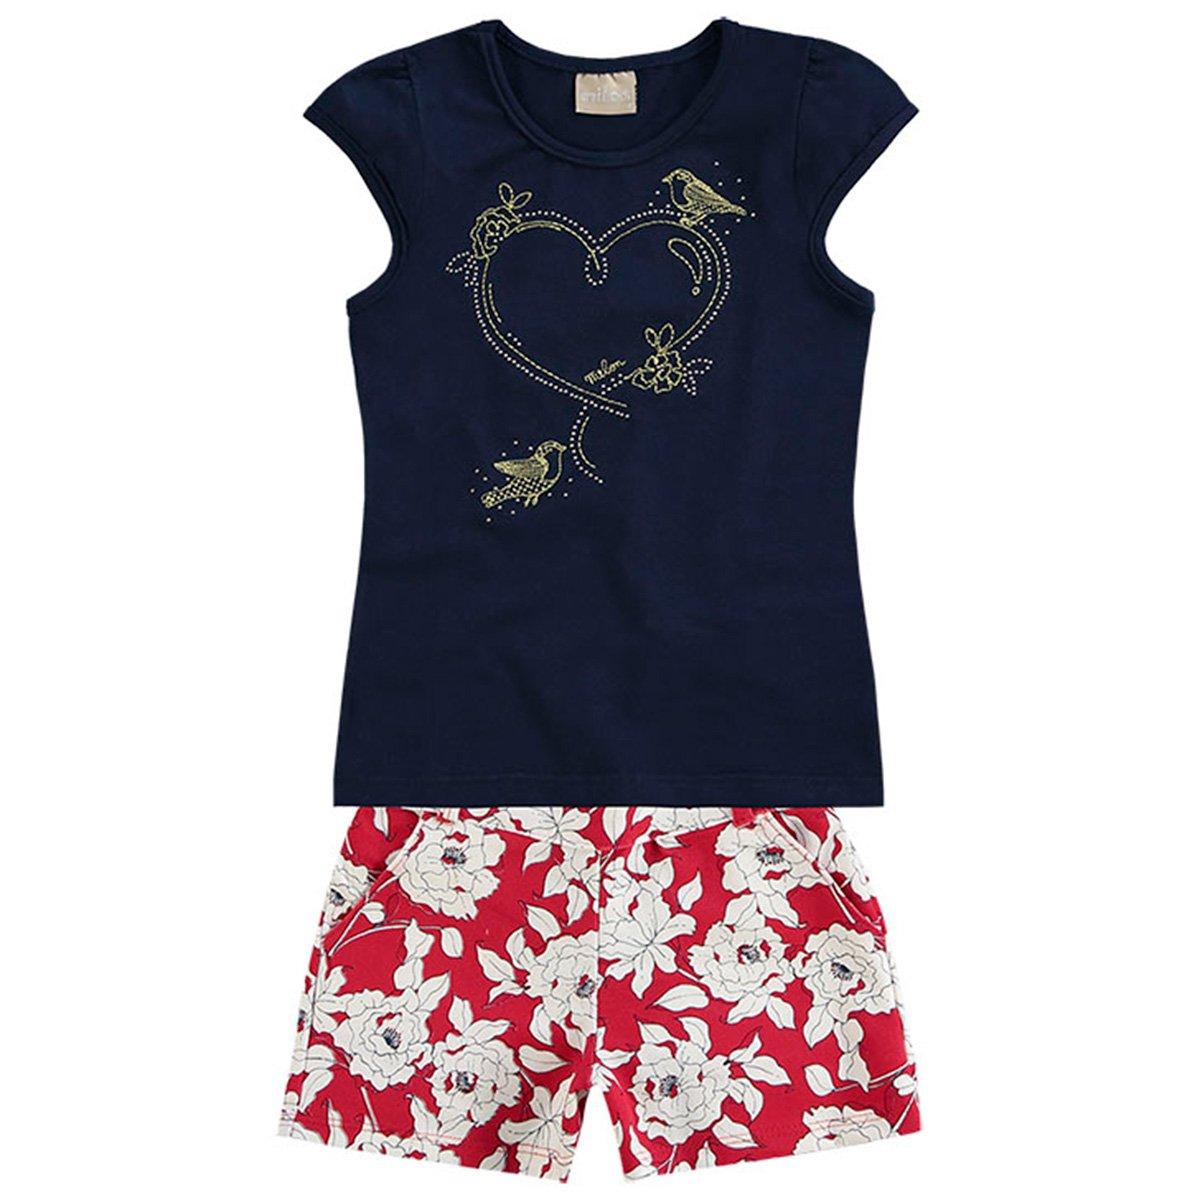 Marinho Milon Conjunto Apliques Floral Feminino Conjunto e e Milon Infantil Infantil Floral wAxPTfq1w